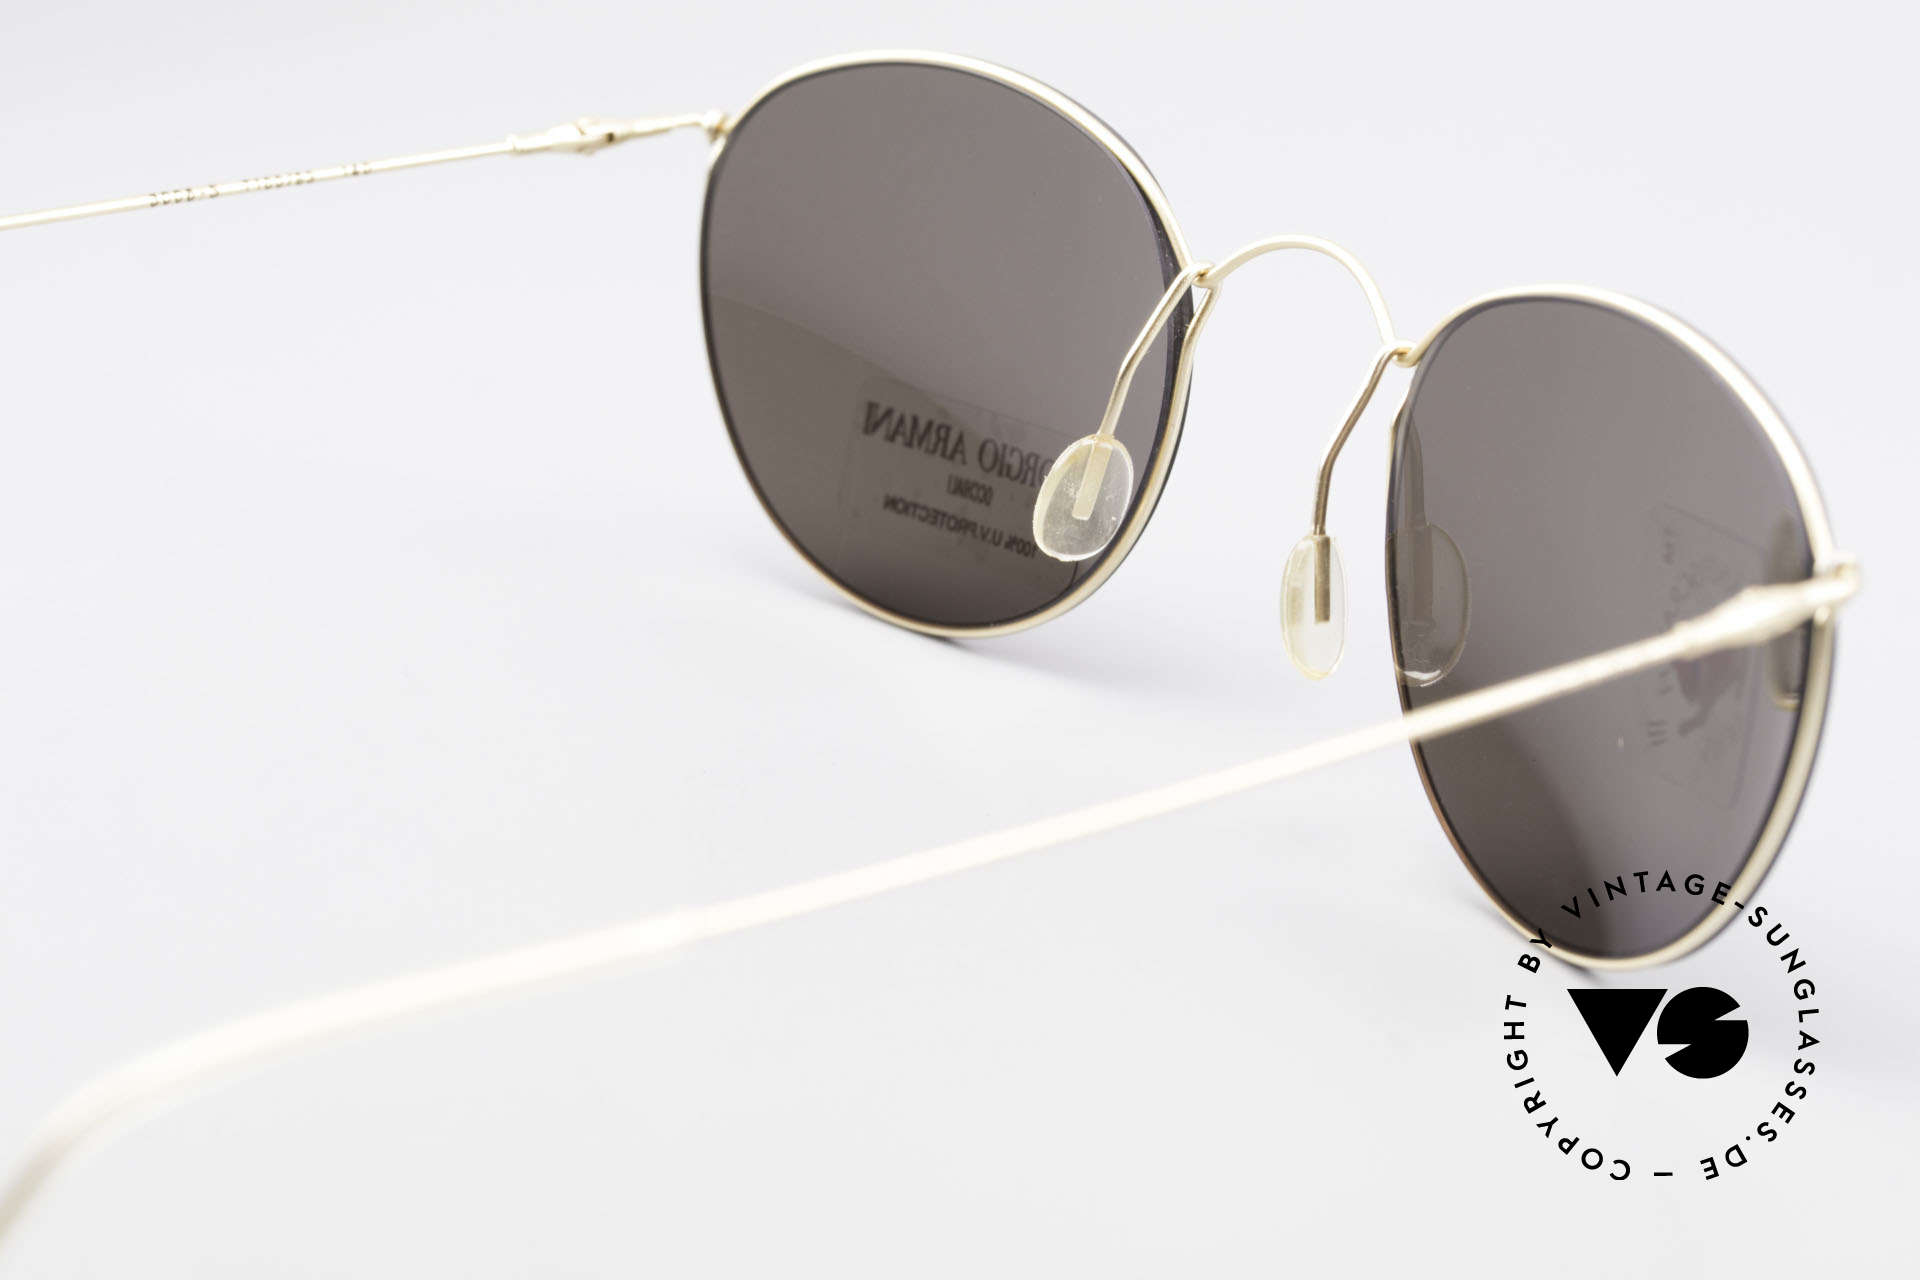 Giorgio Armani 3006 90's Panto Wire Sunglasses, sun lenses can be replaced with prescription lenses, too, Made for Men